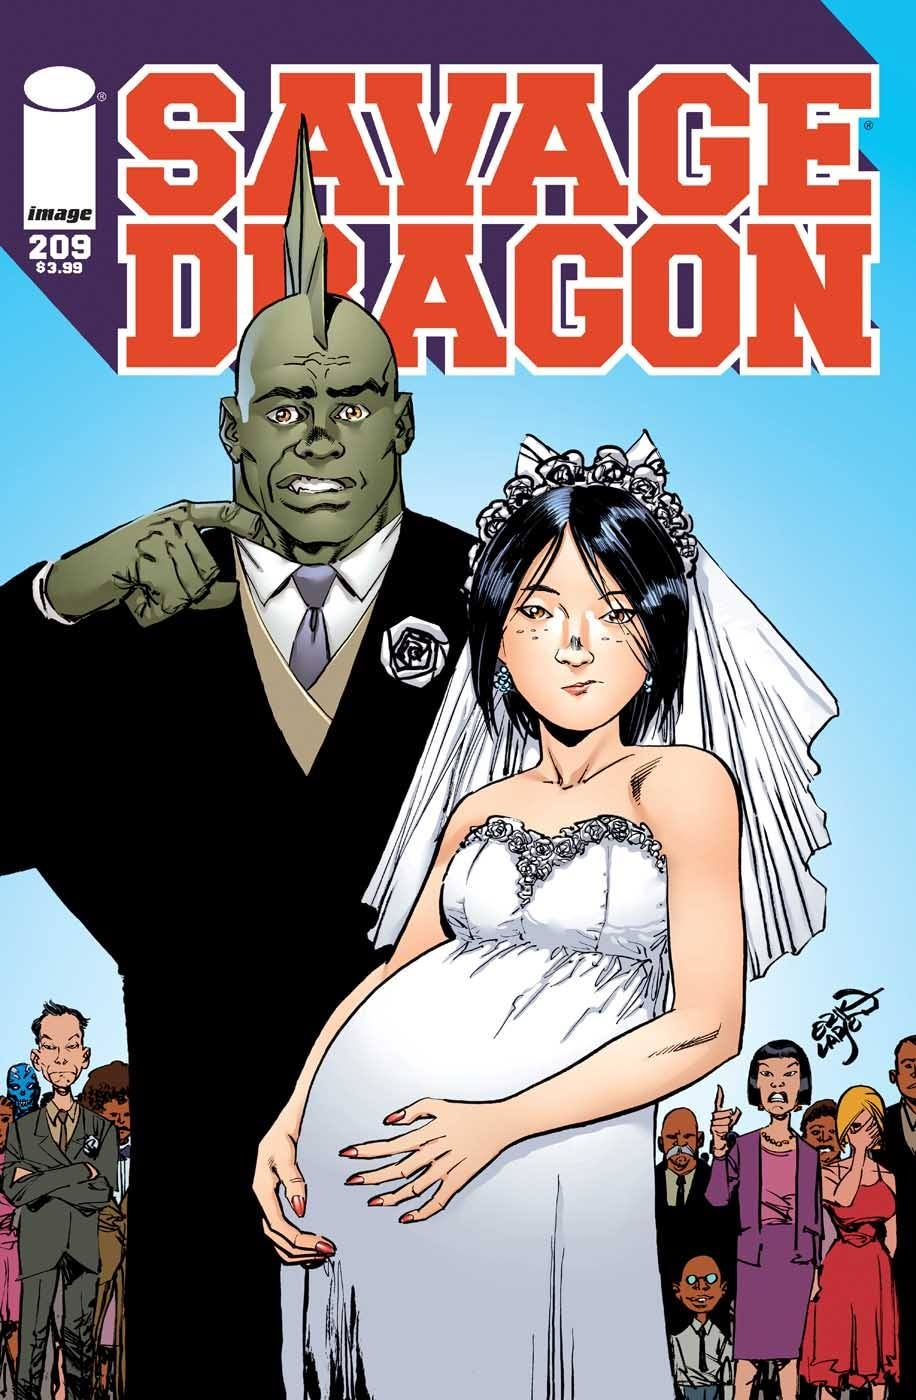 Impreg Comics Minimalist a shotgun wedding for savage dragon?